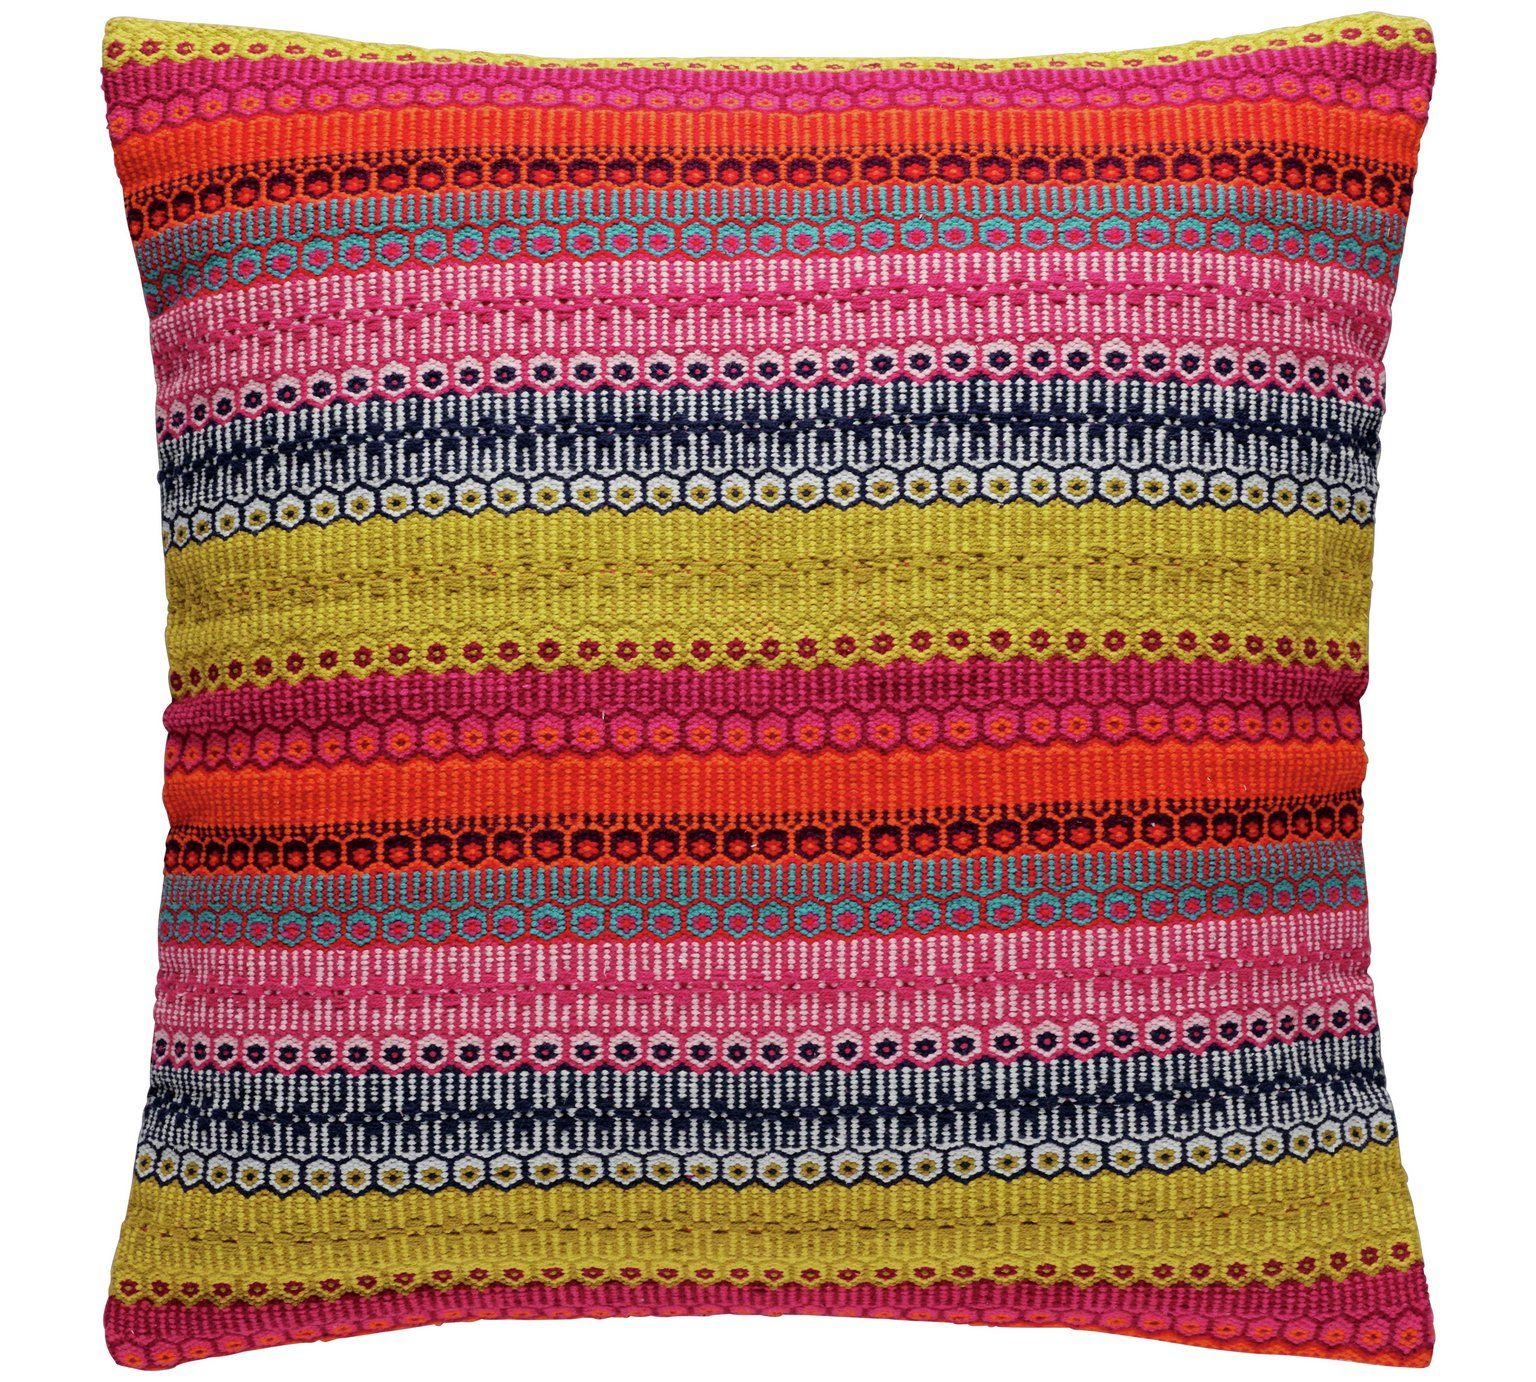 Buy Habitat Agnes Cushion 60x60cm Multicoloured Cushions Argos Multicoloured Cushions Striped Cushions Embroidered Cushions